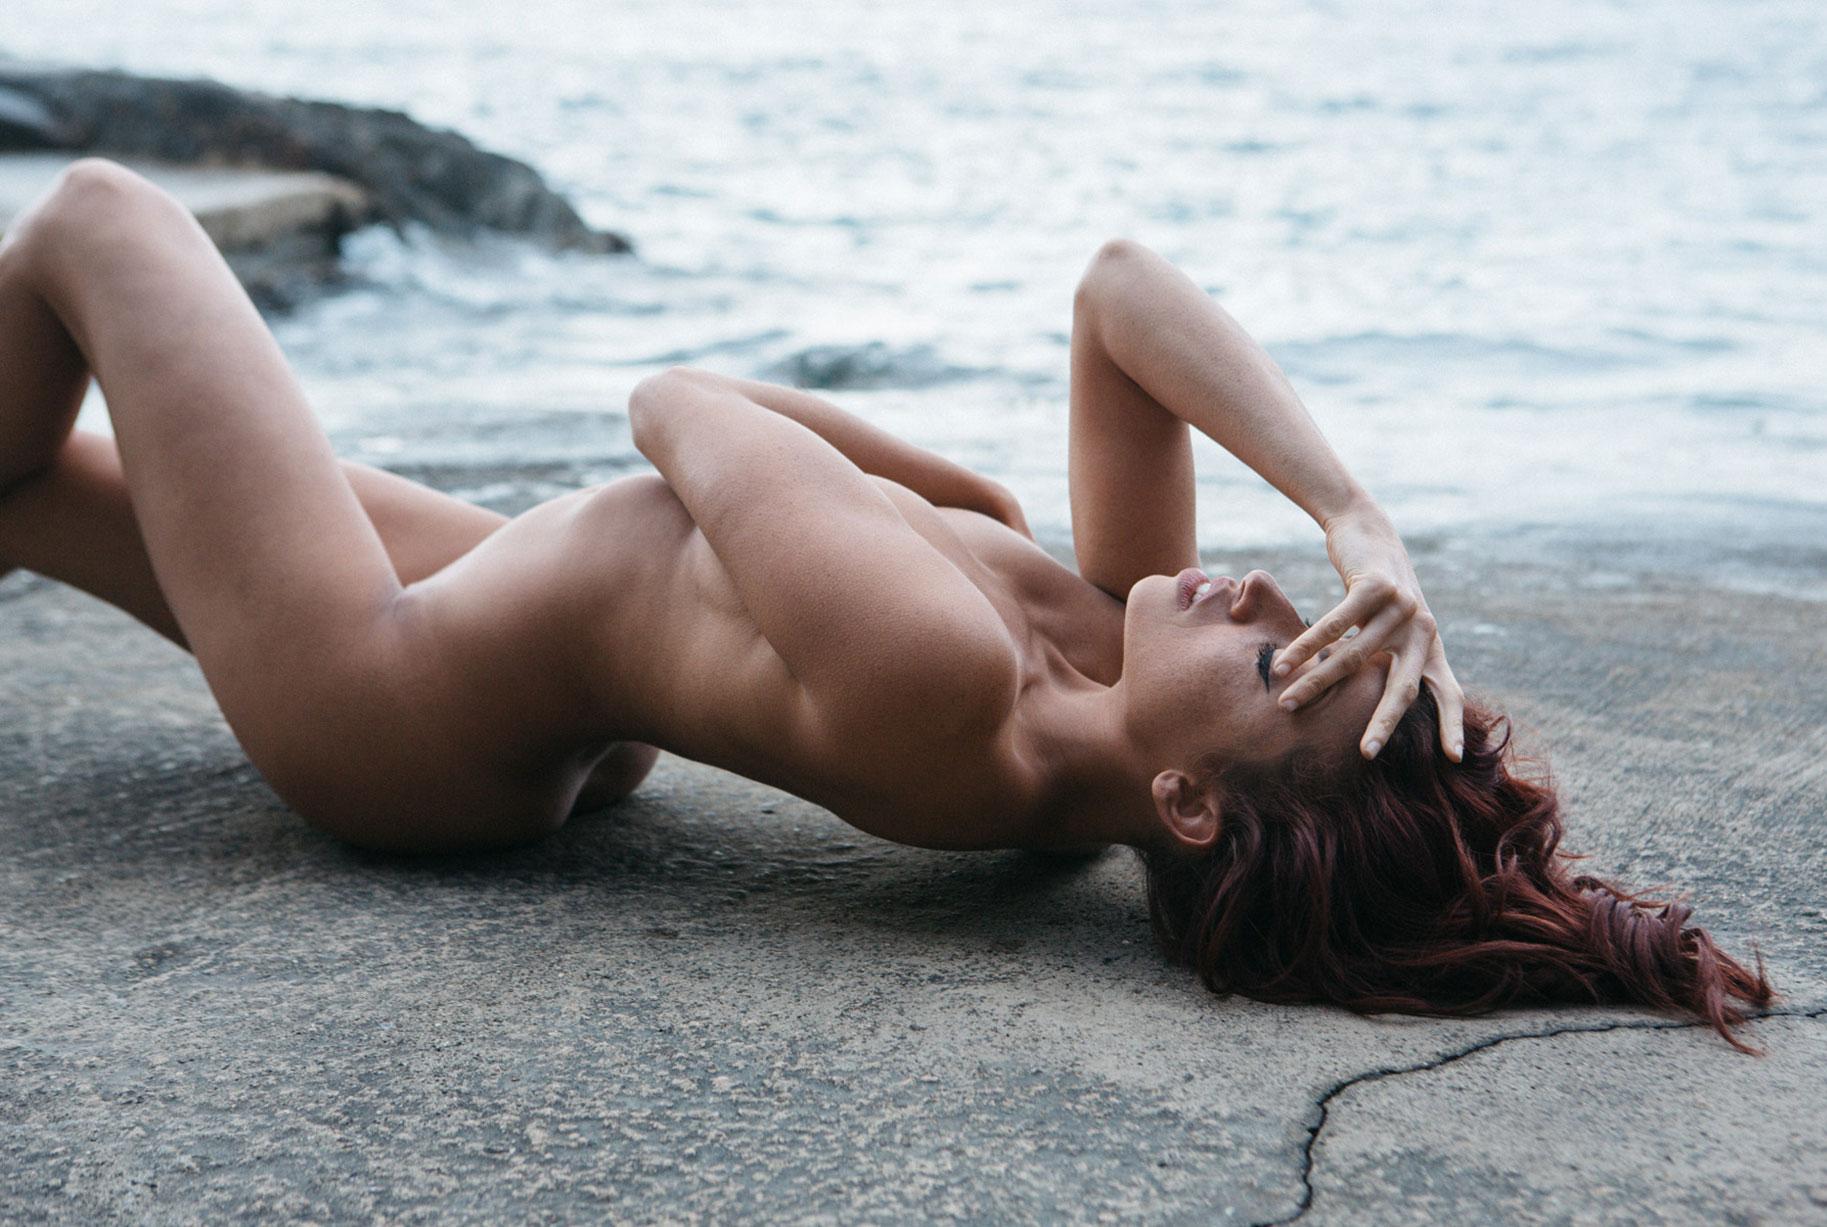 Clara Rene nude by Maxime Besse